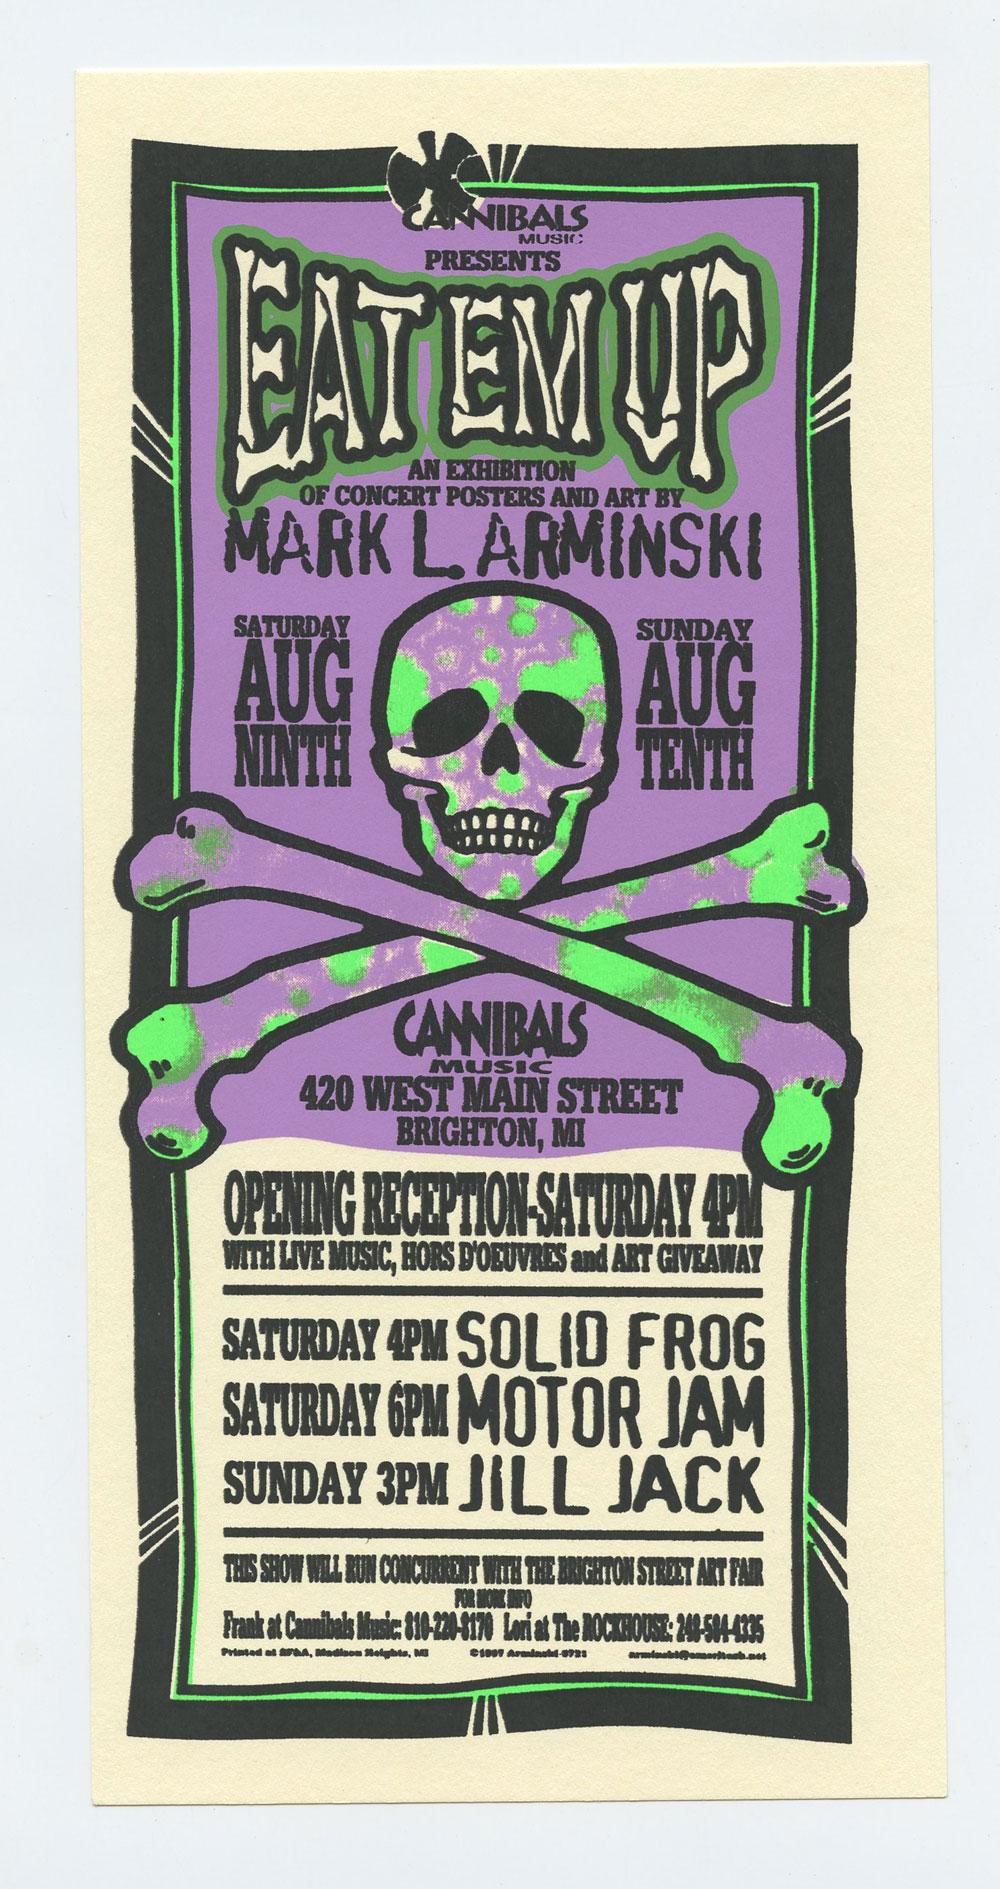 Eat Em Up Exhibition of Concert Posters & Art 1997 Aug 9 Handbill Mark Arminski